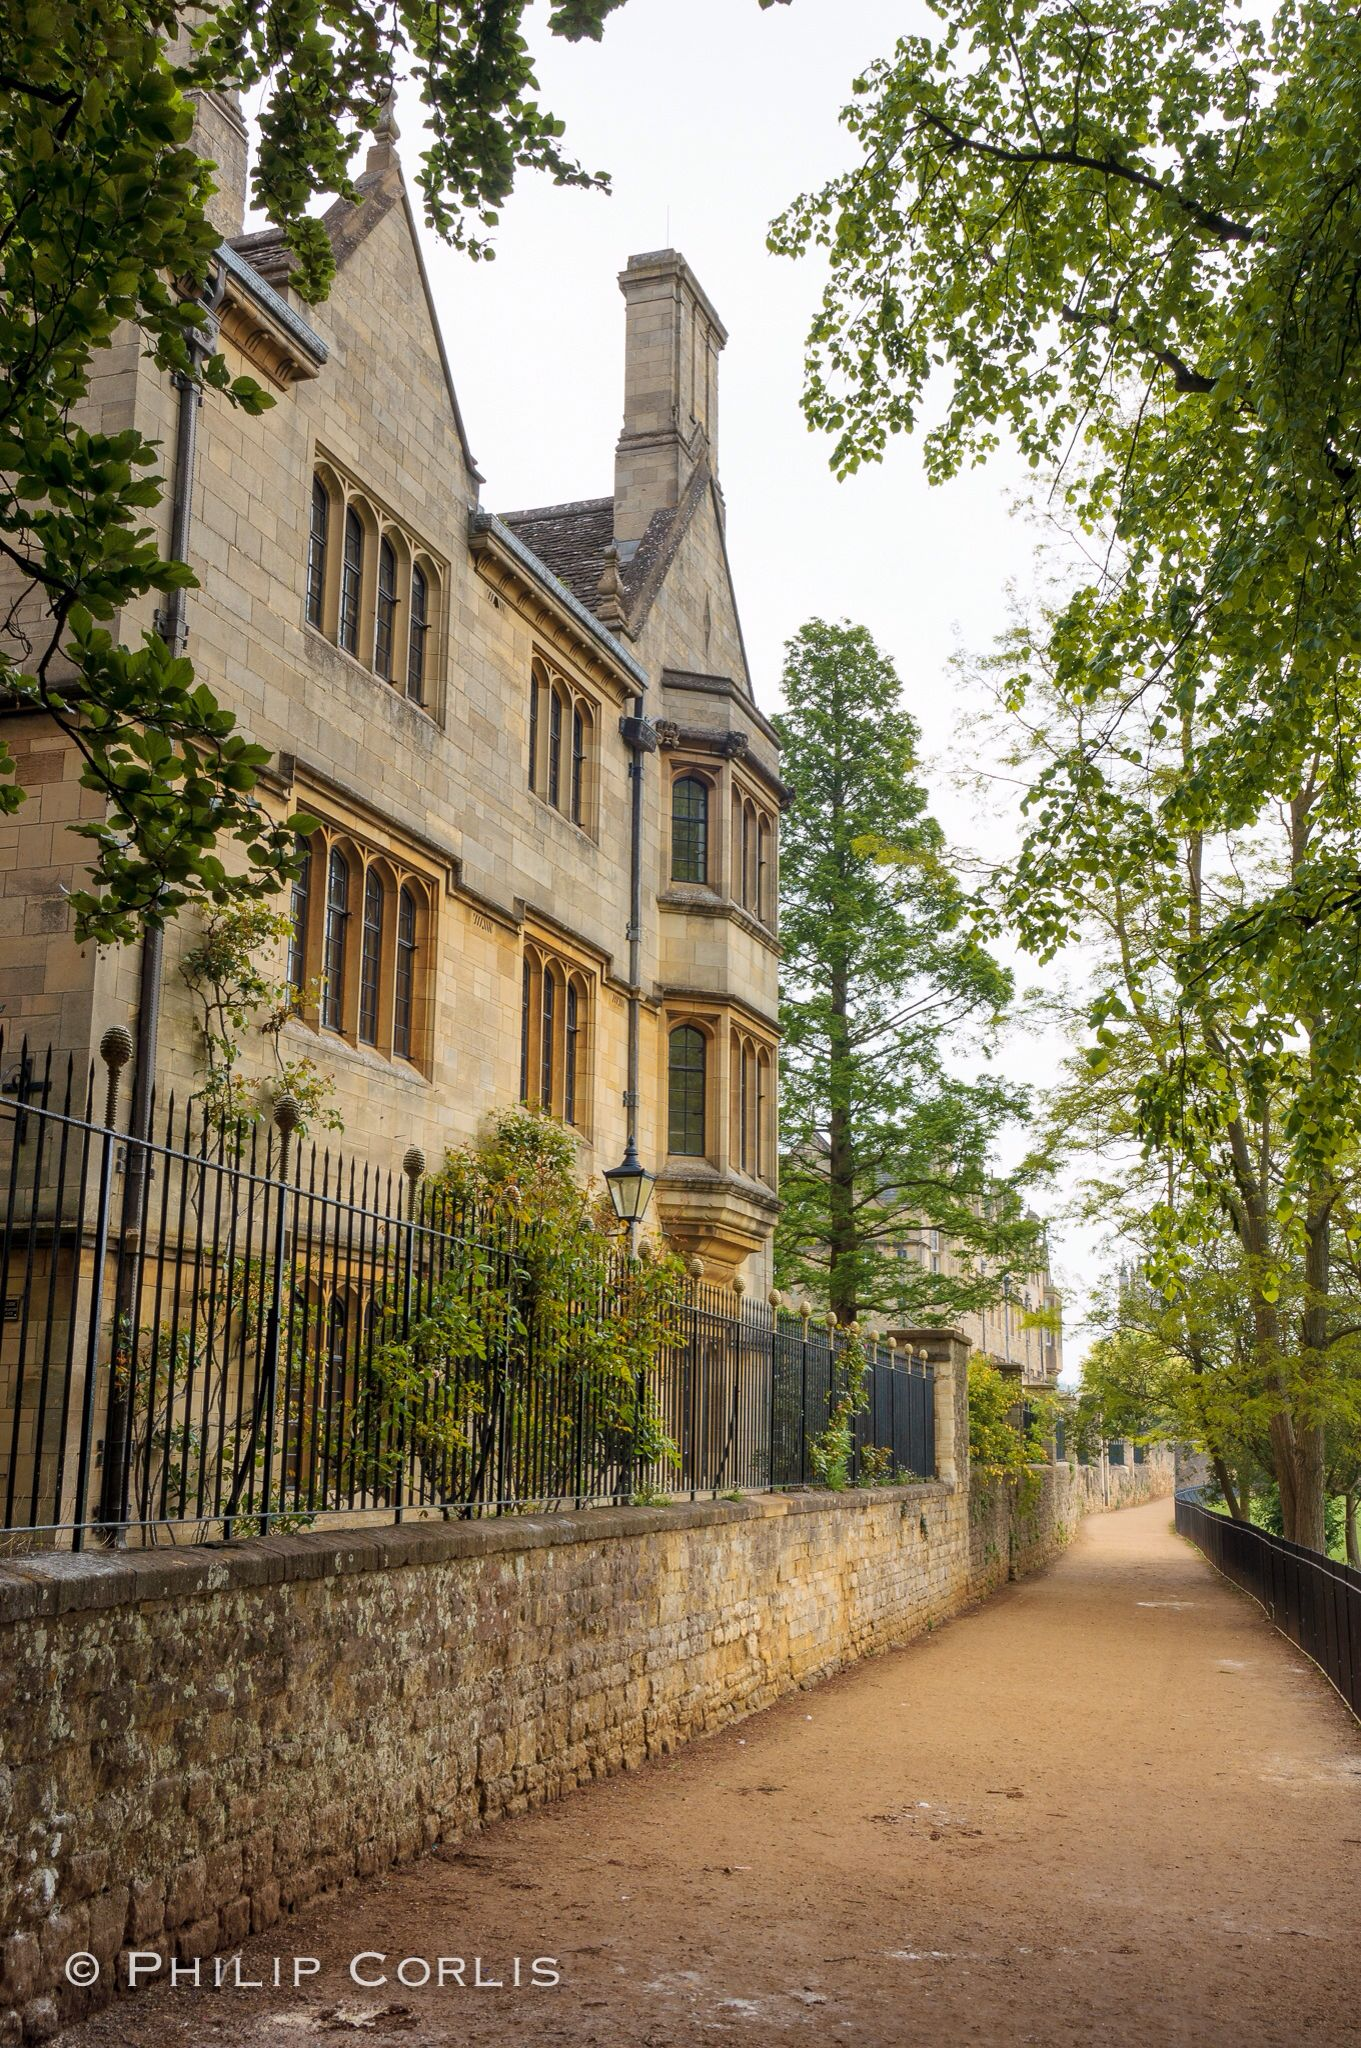 Behind Merton College, Oxford, England. Oxford england